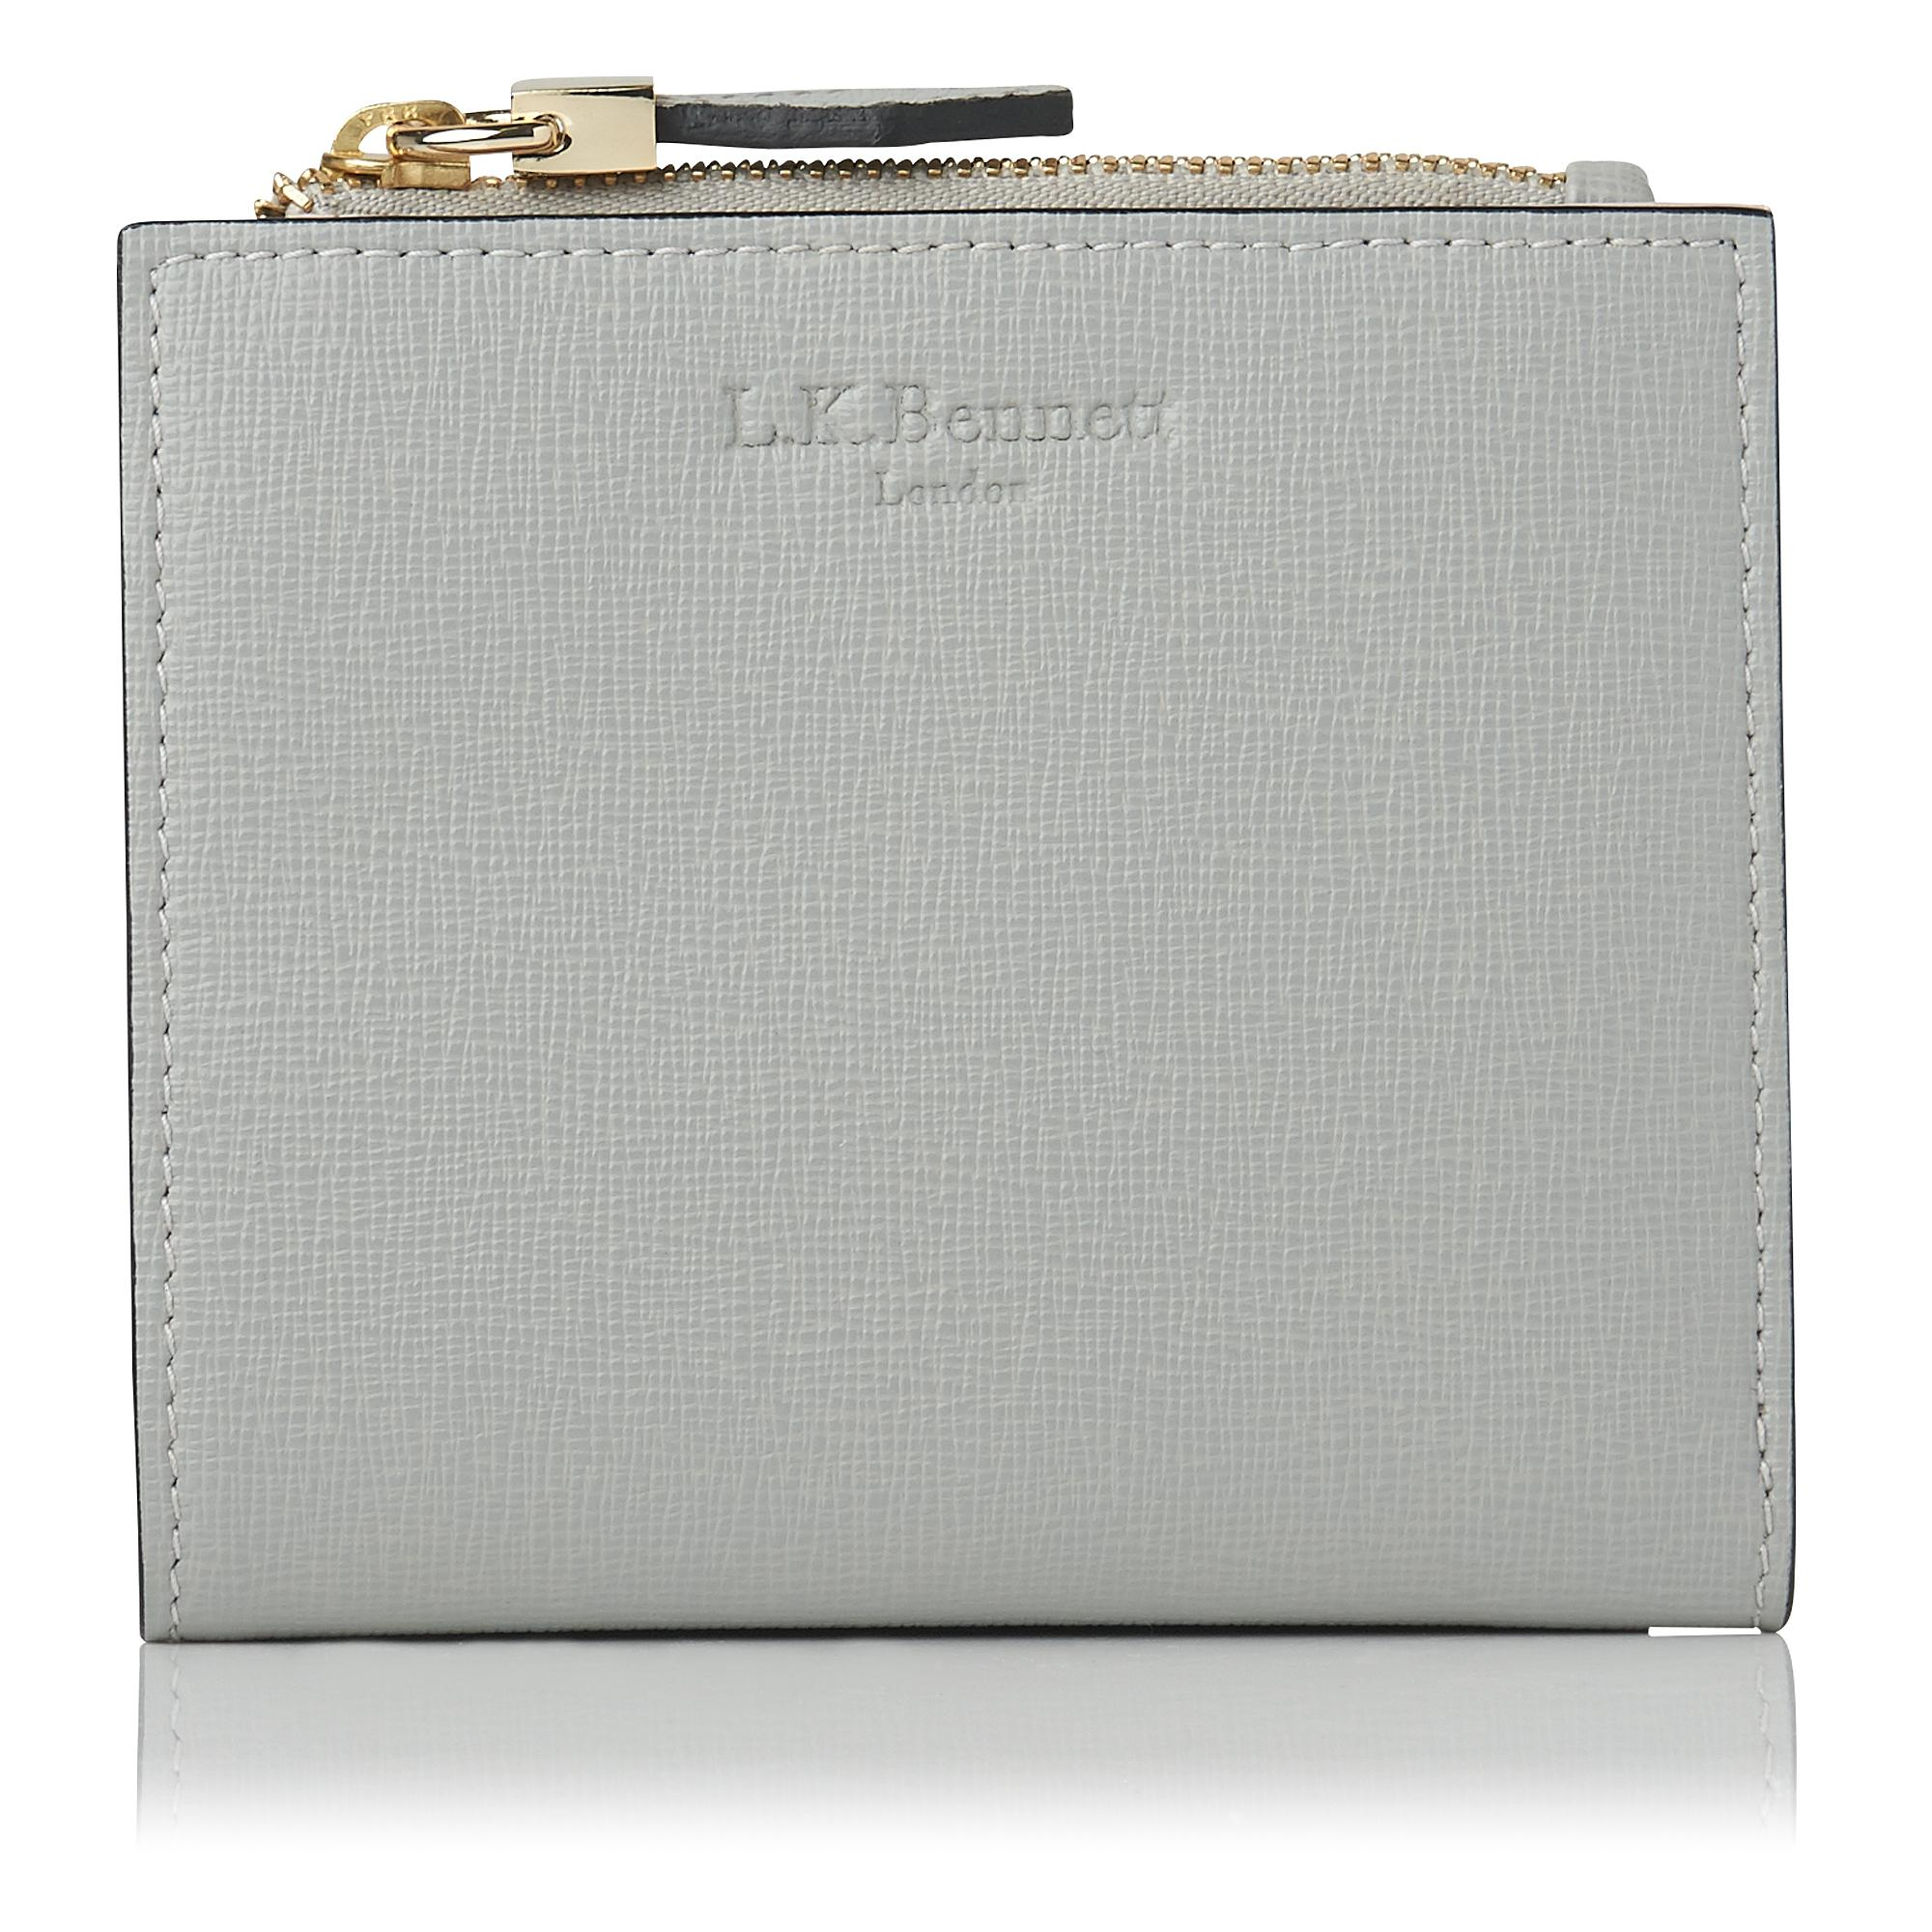 L.K.Bennett Kira Small Wallet